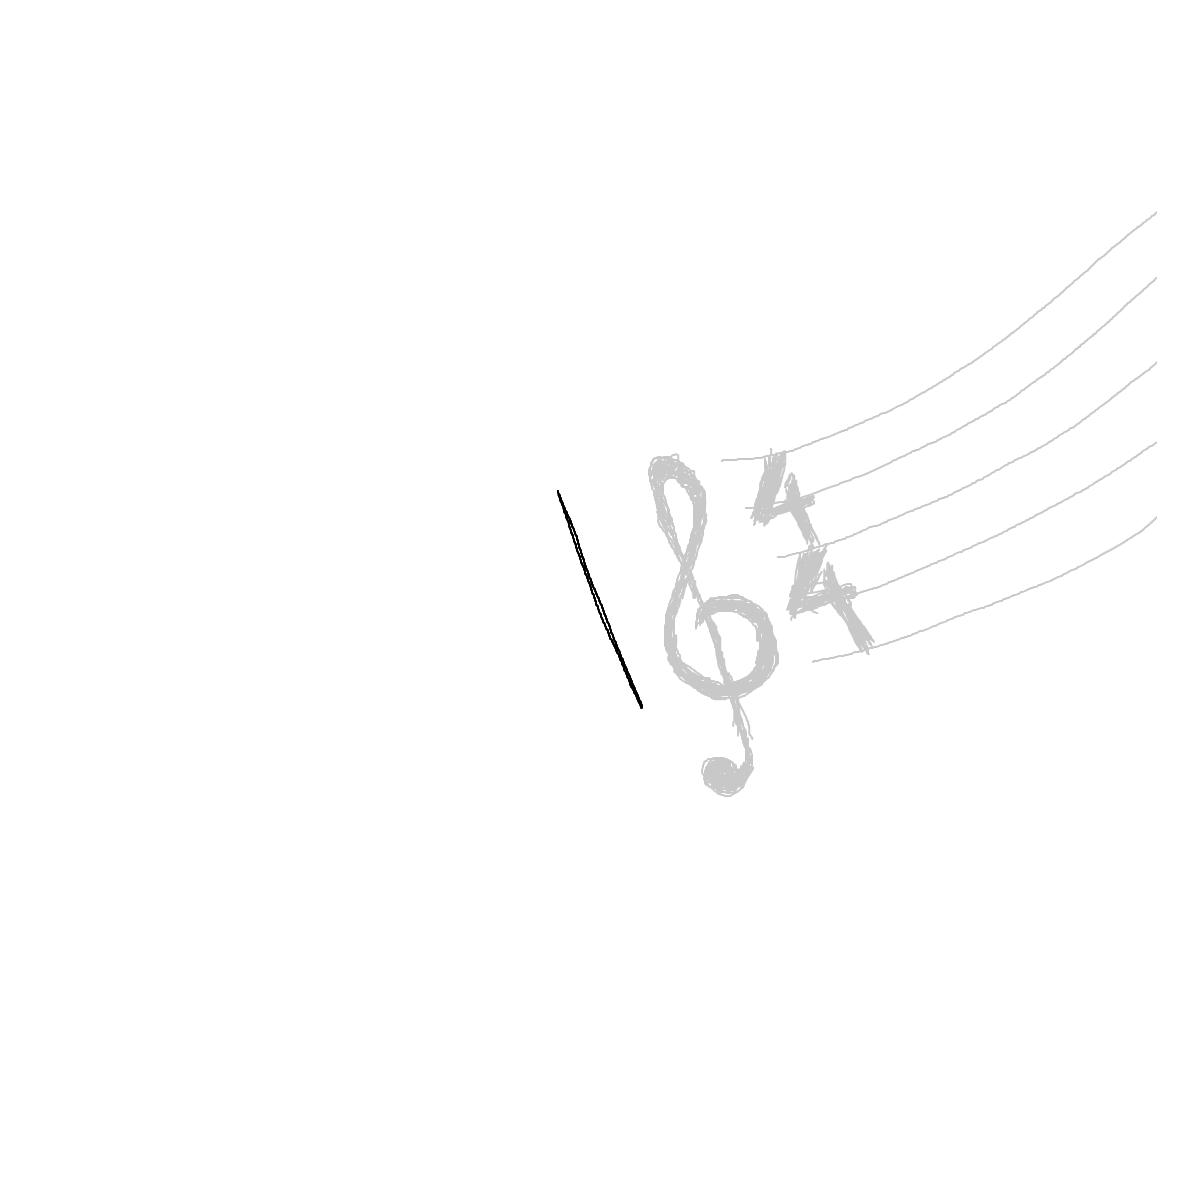 BAAAM drawing#4760 lat:39.7172126770019500lng: -75.6447525024414000